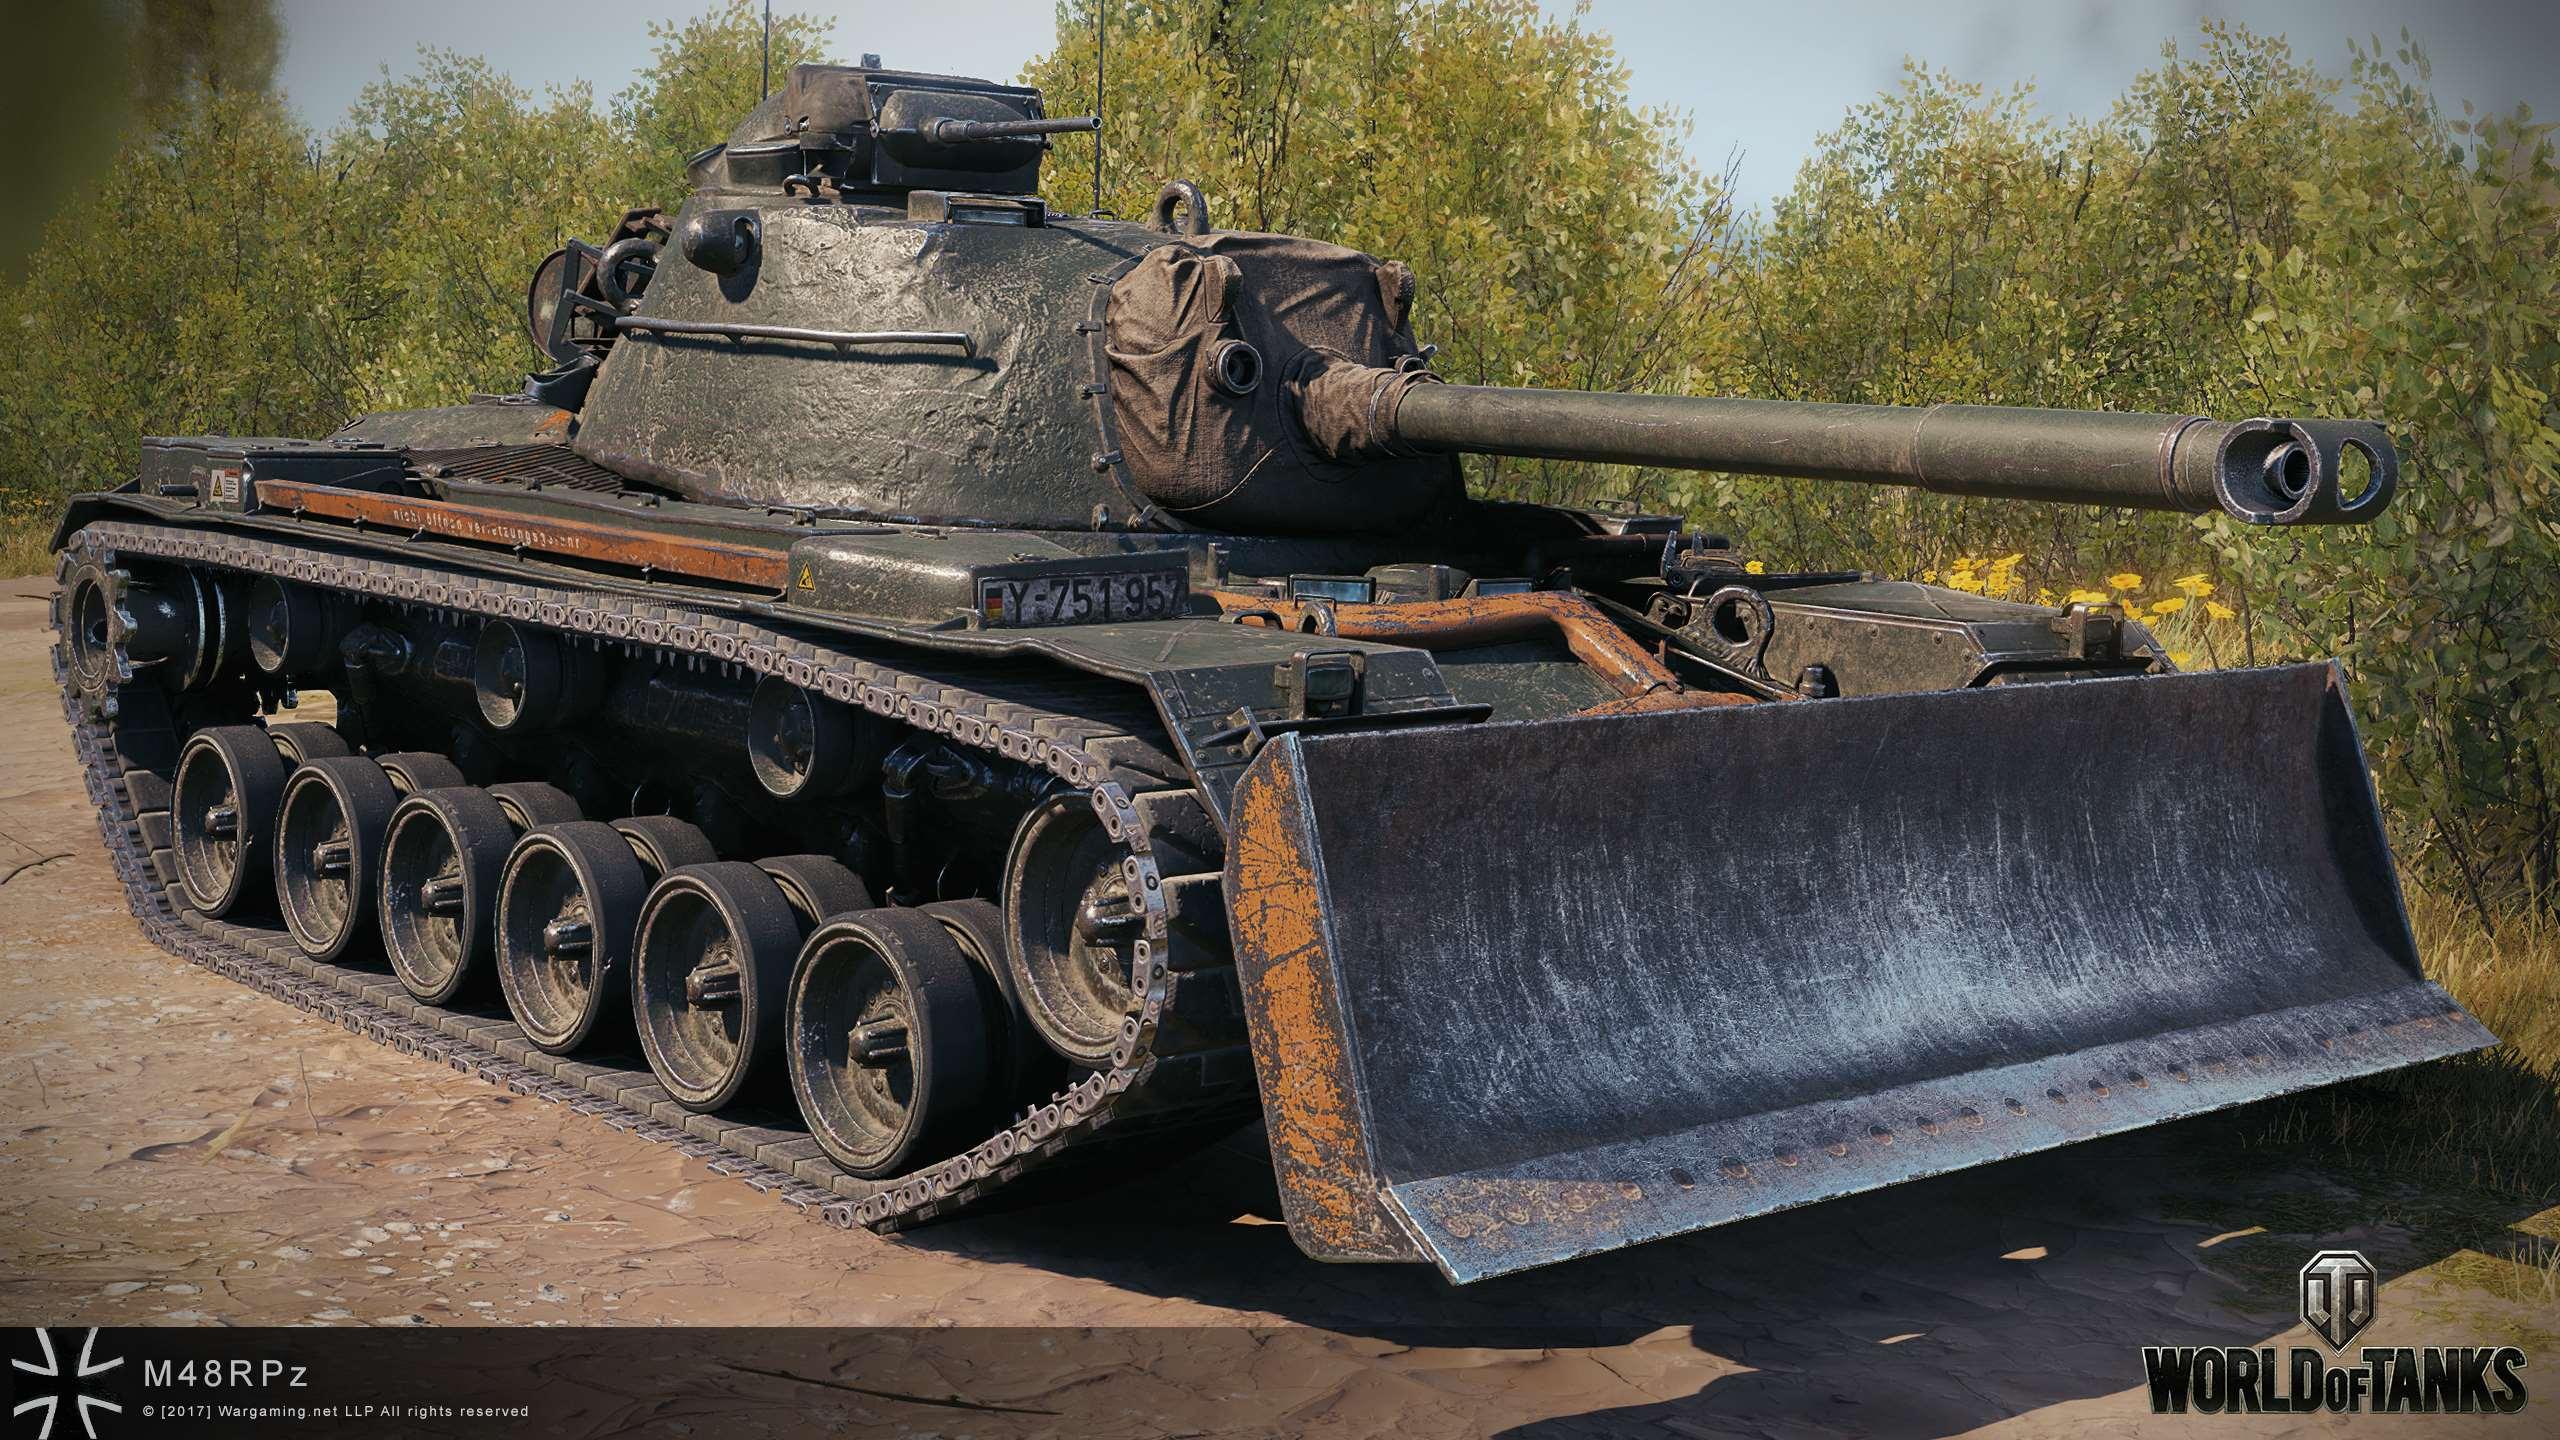 M48A2 Räumpanzer — немецкий средний прем танк 8 уровня в World of Tanks